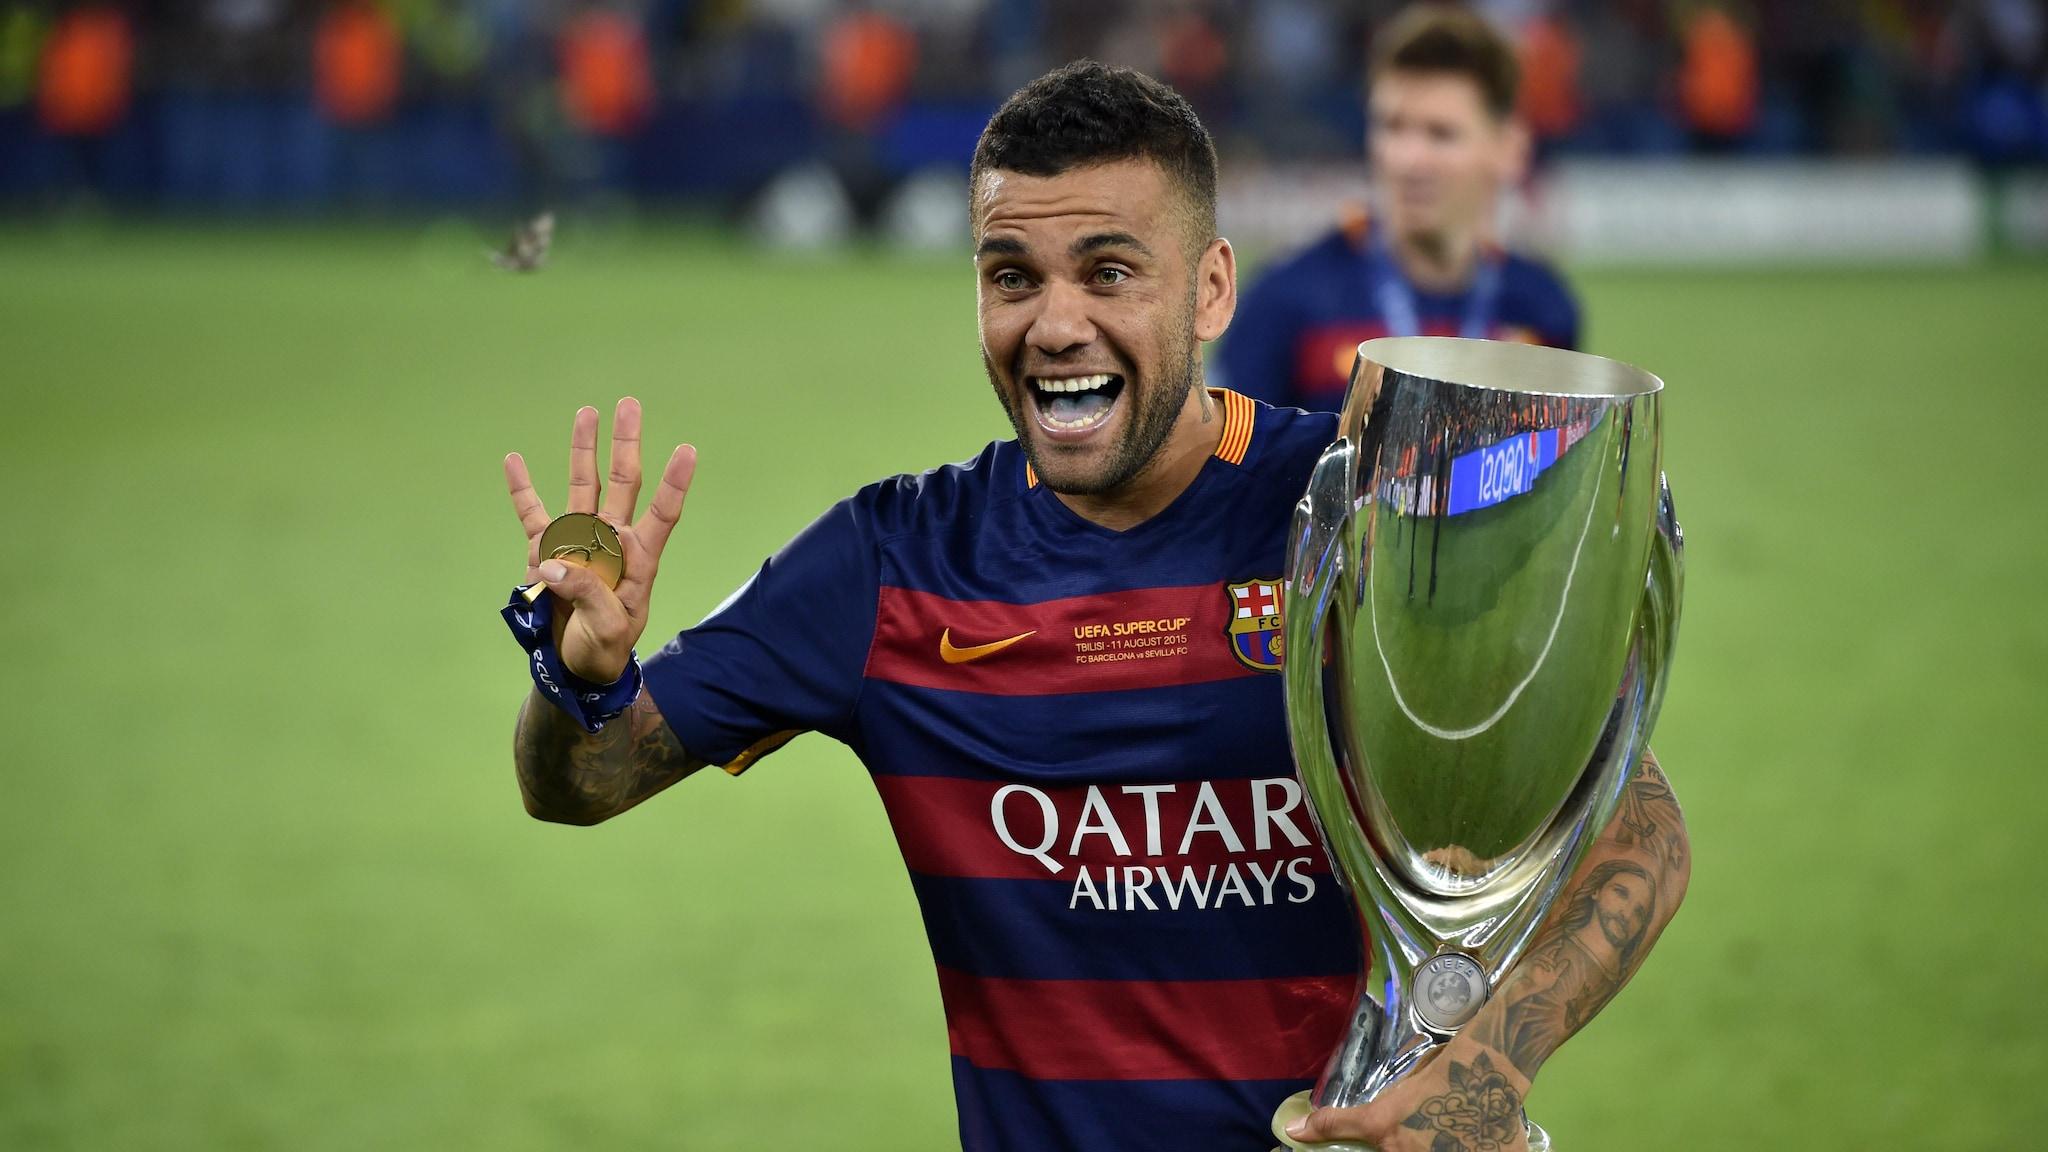 Super Coupe de l'UEFA : les records